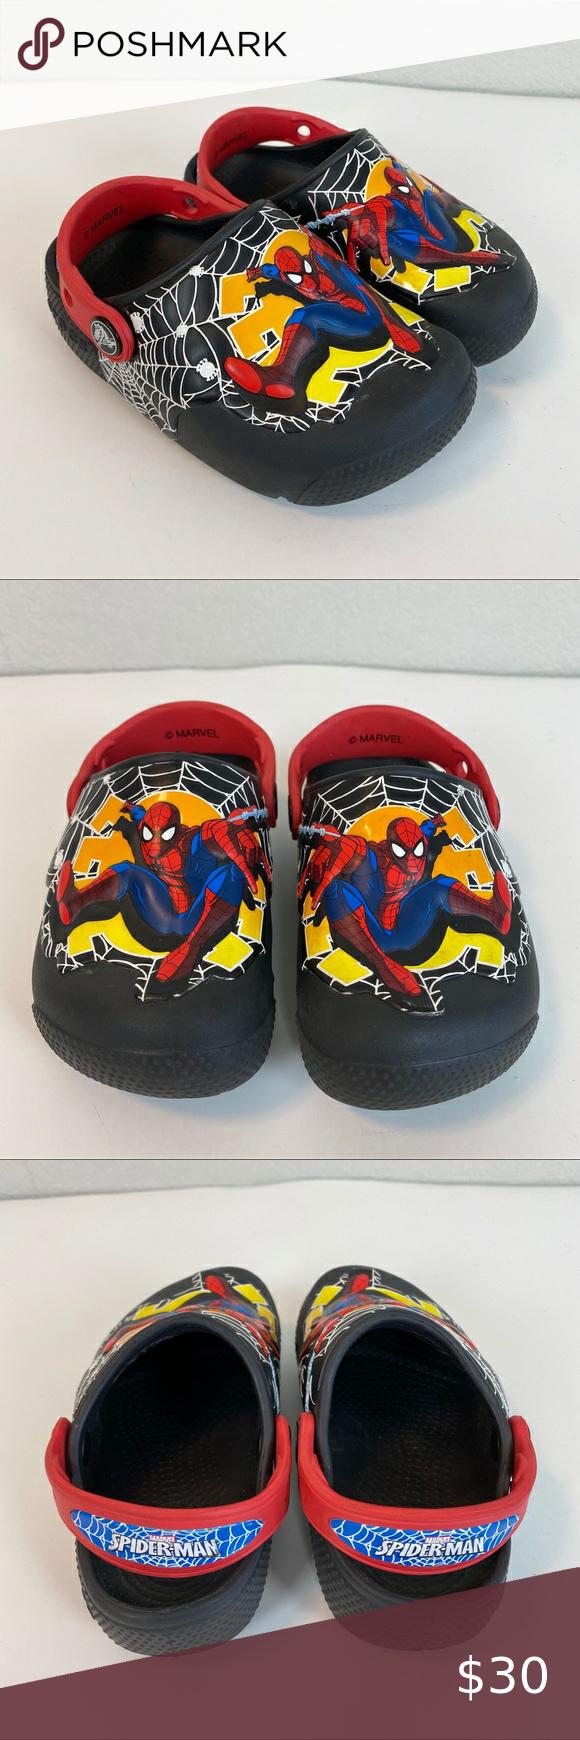 Crocs Spiderman Light Up Clogs Shoes